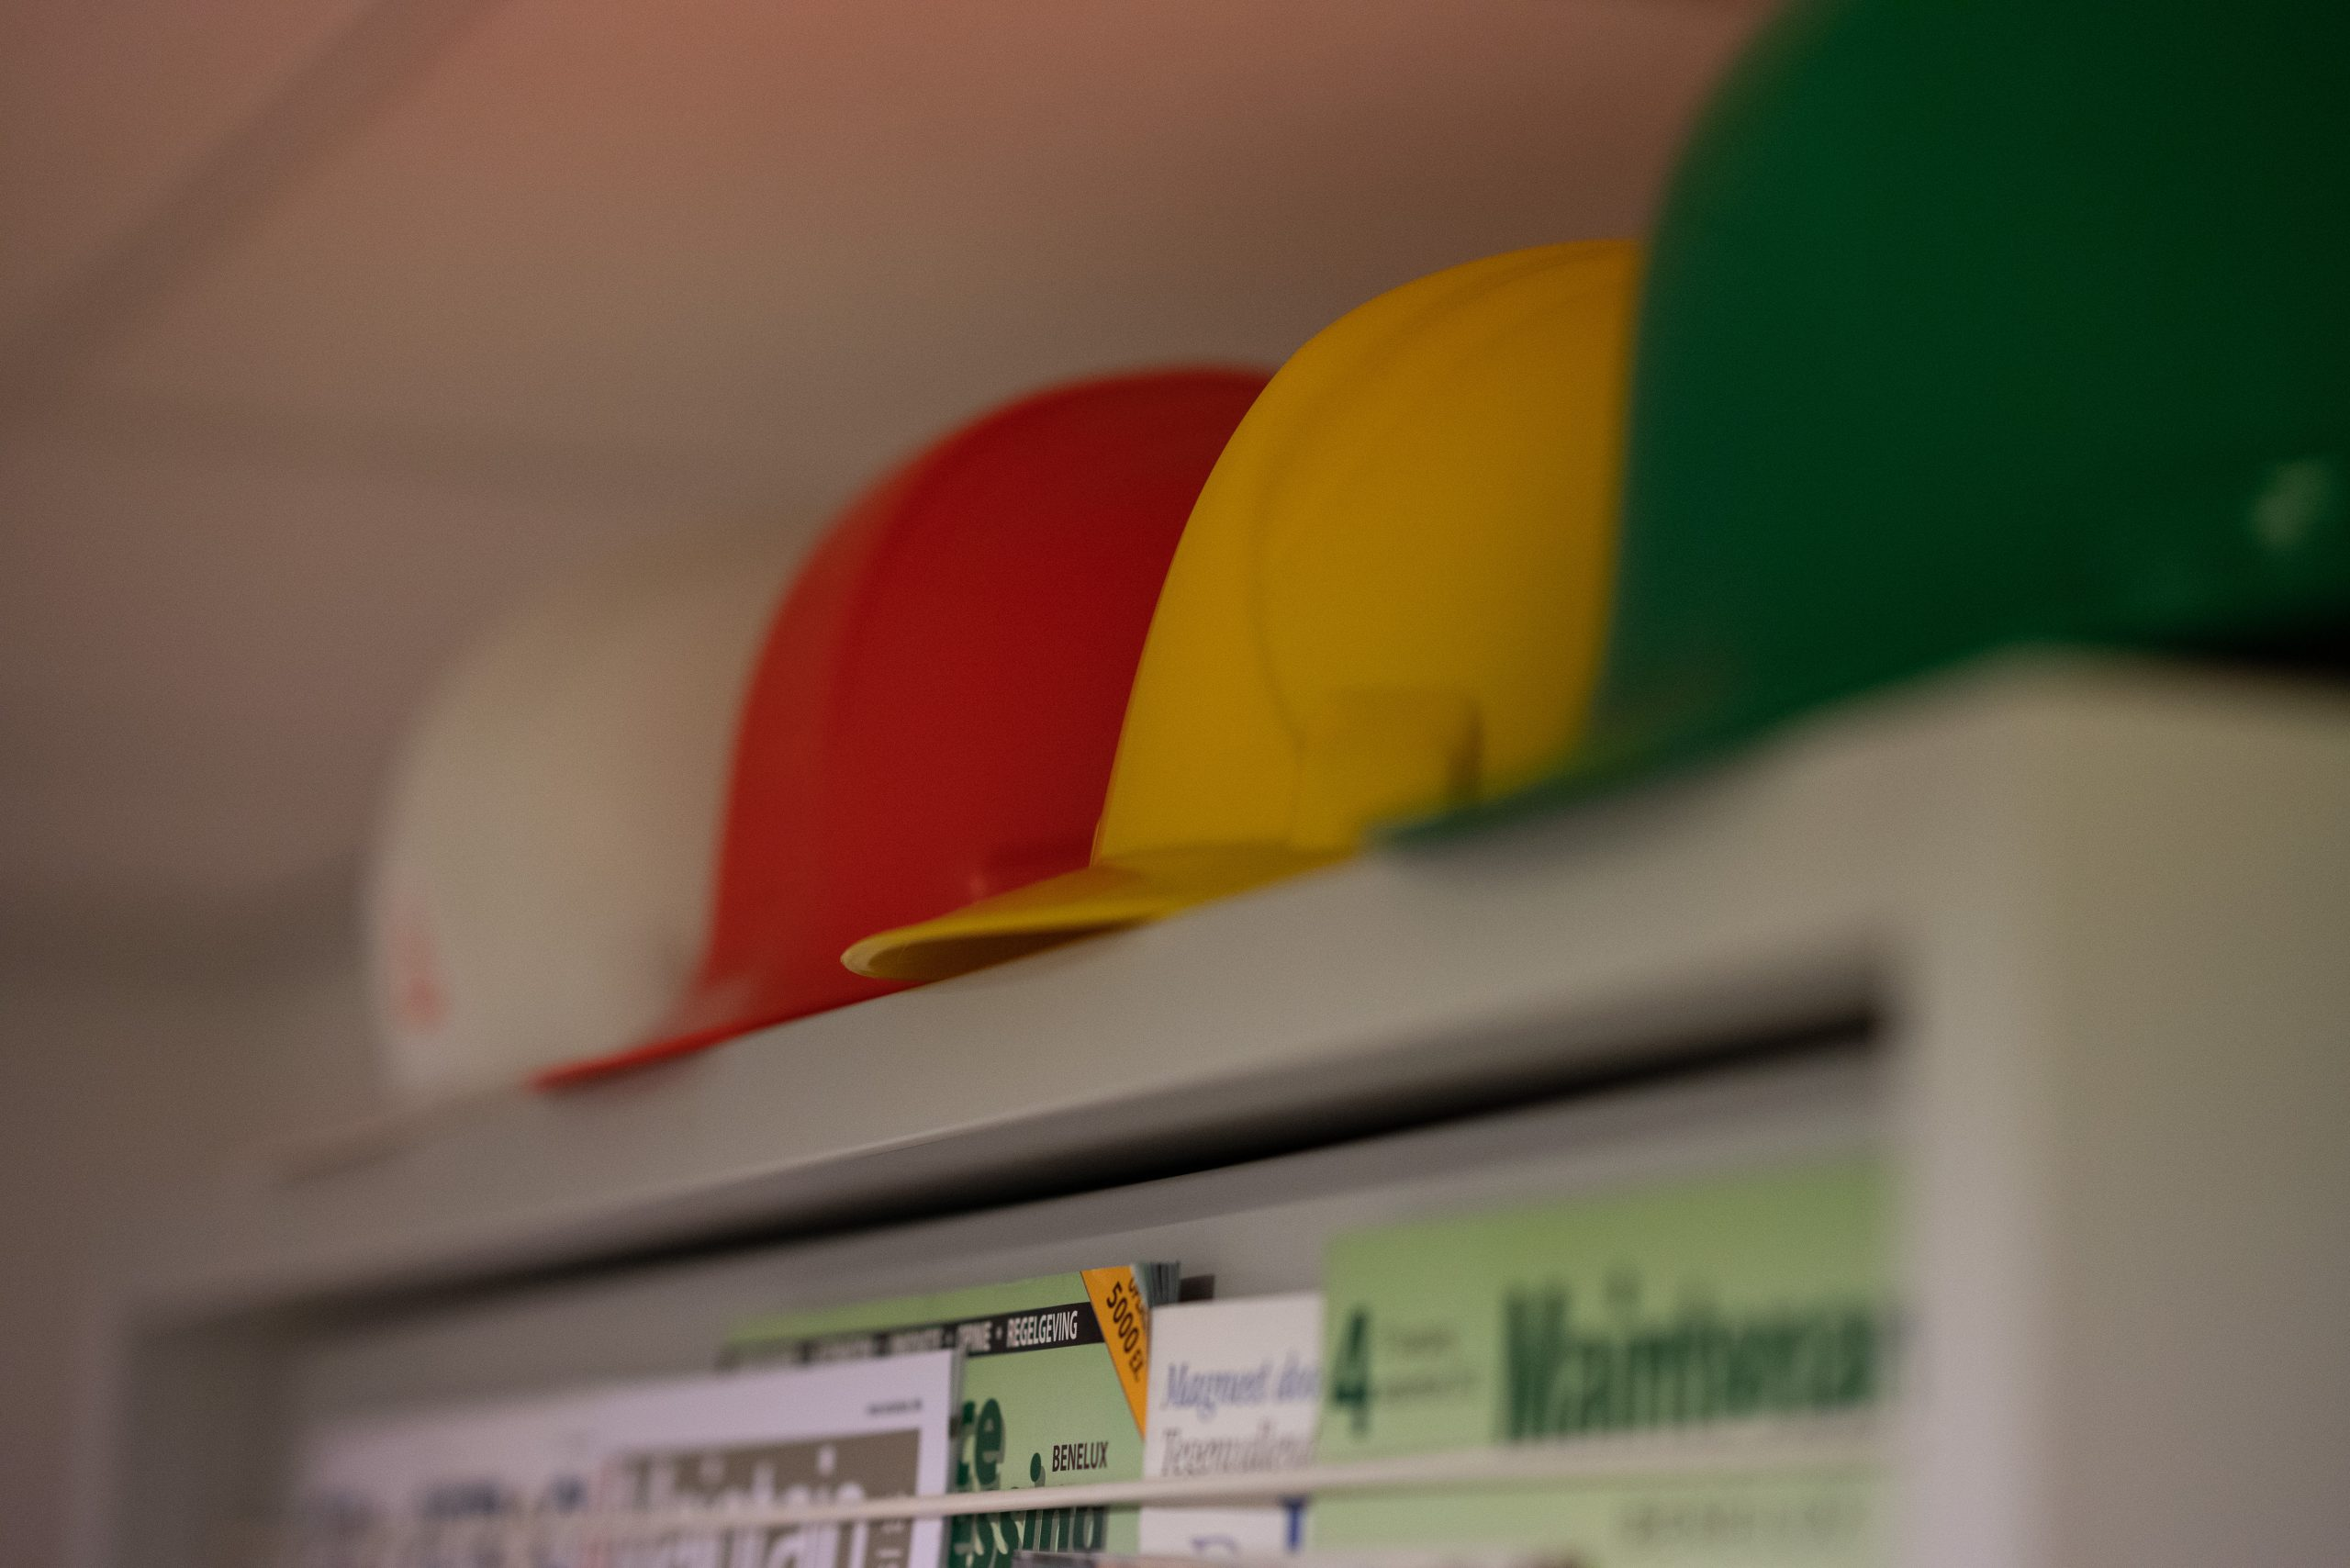 McMain helm - Whitepaper audits